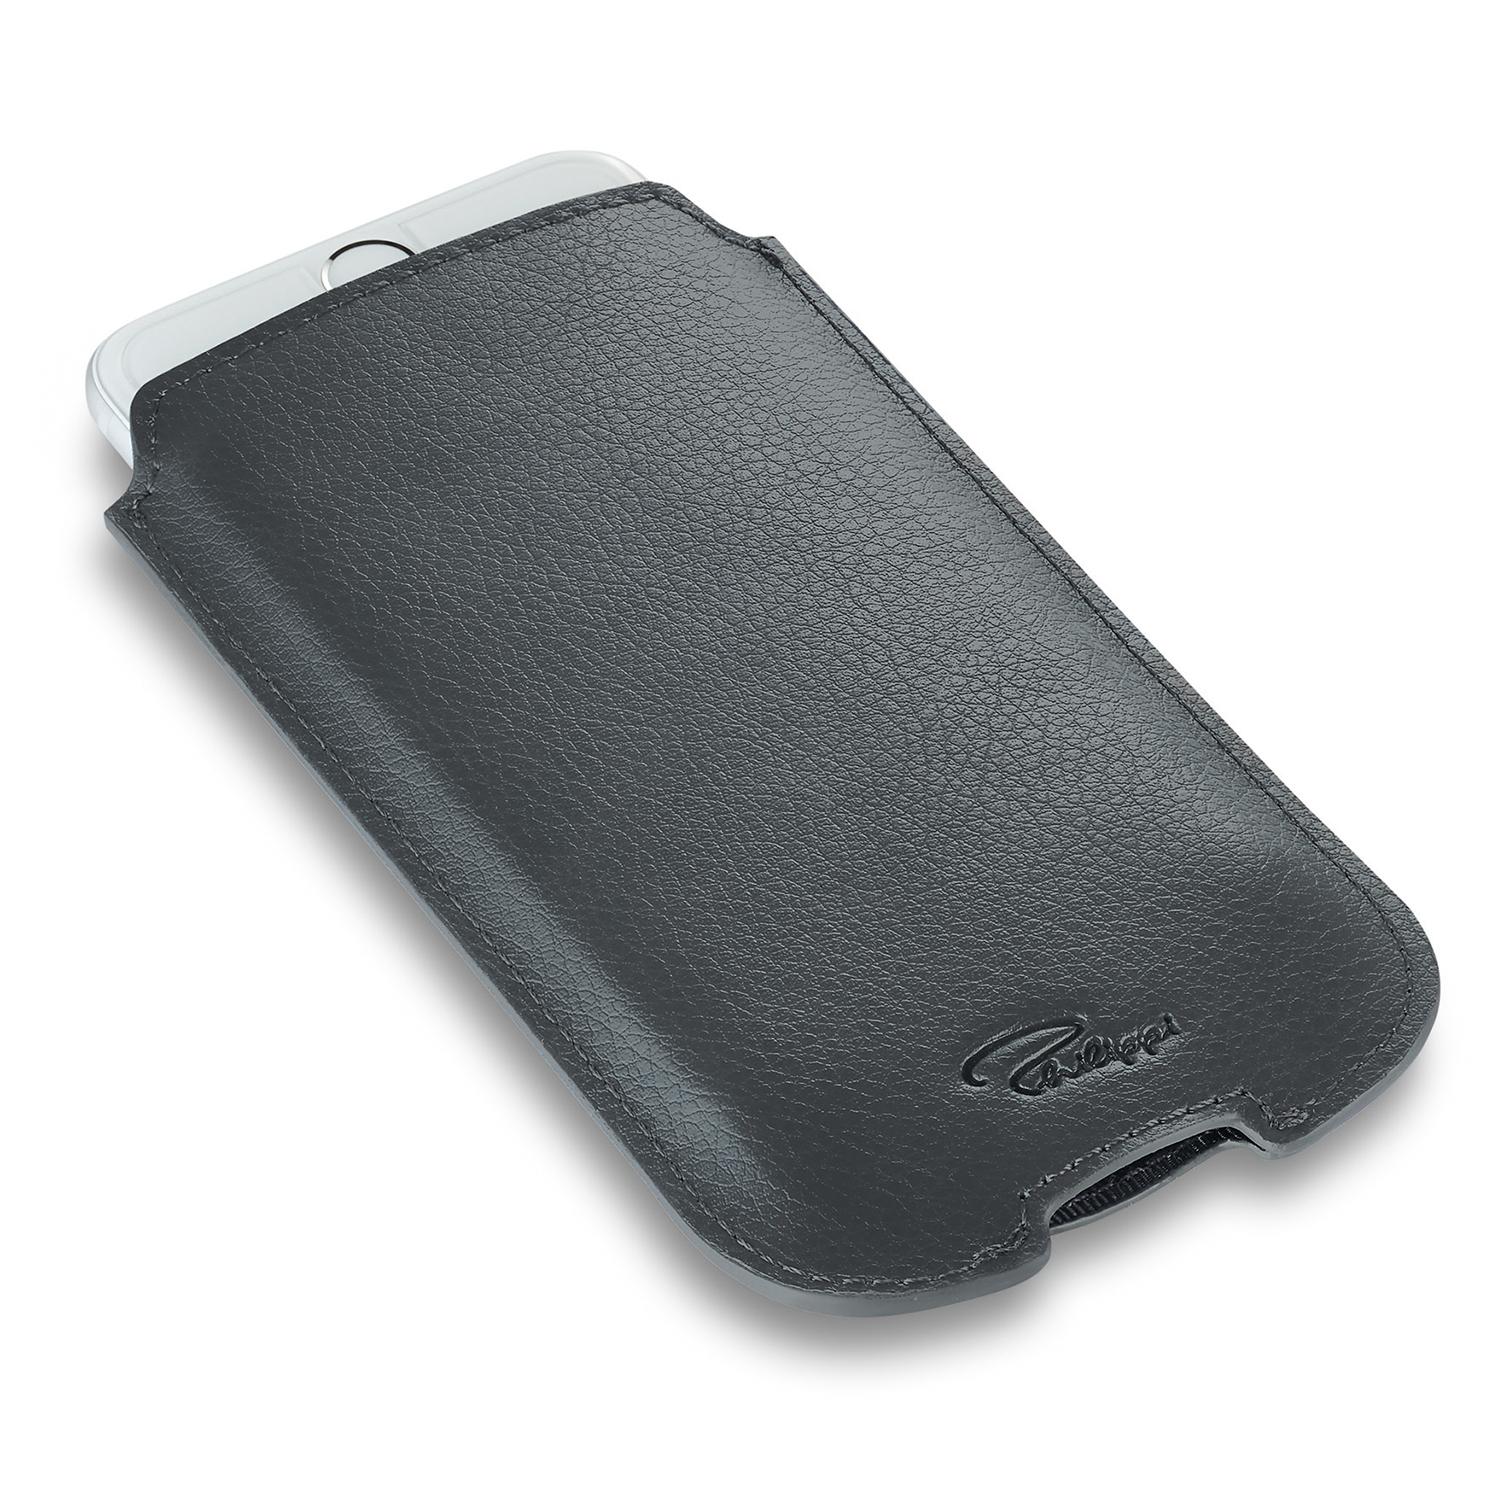 Philippi – Grey Leather 'ALEGRO' iPhone 6/7/8 Case in Presentation Gift Box